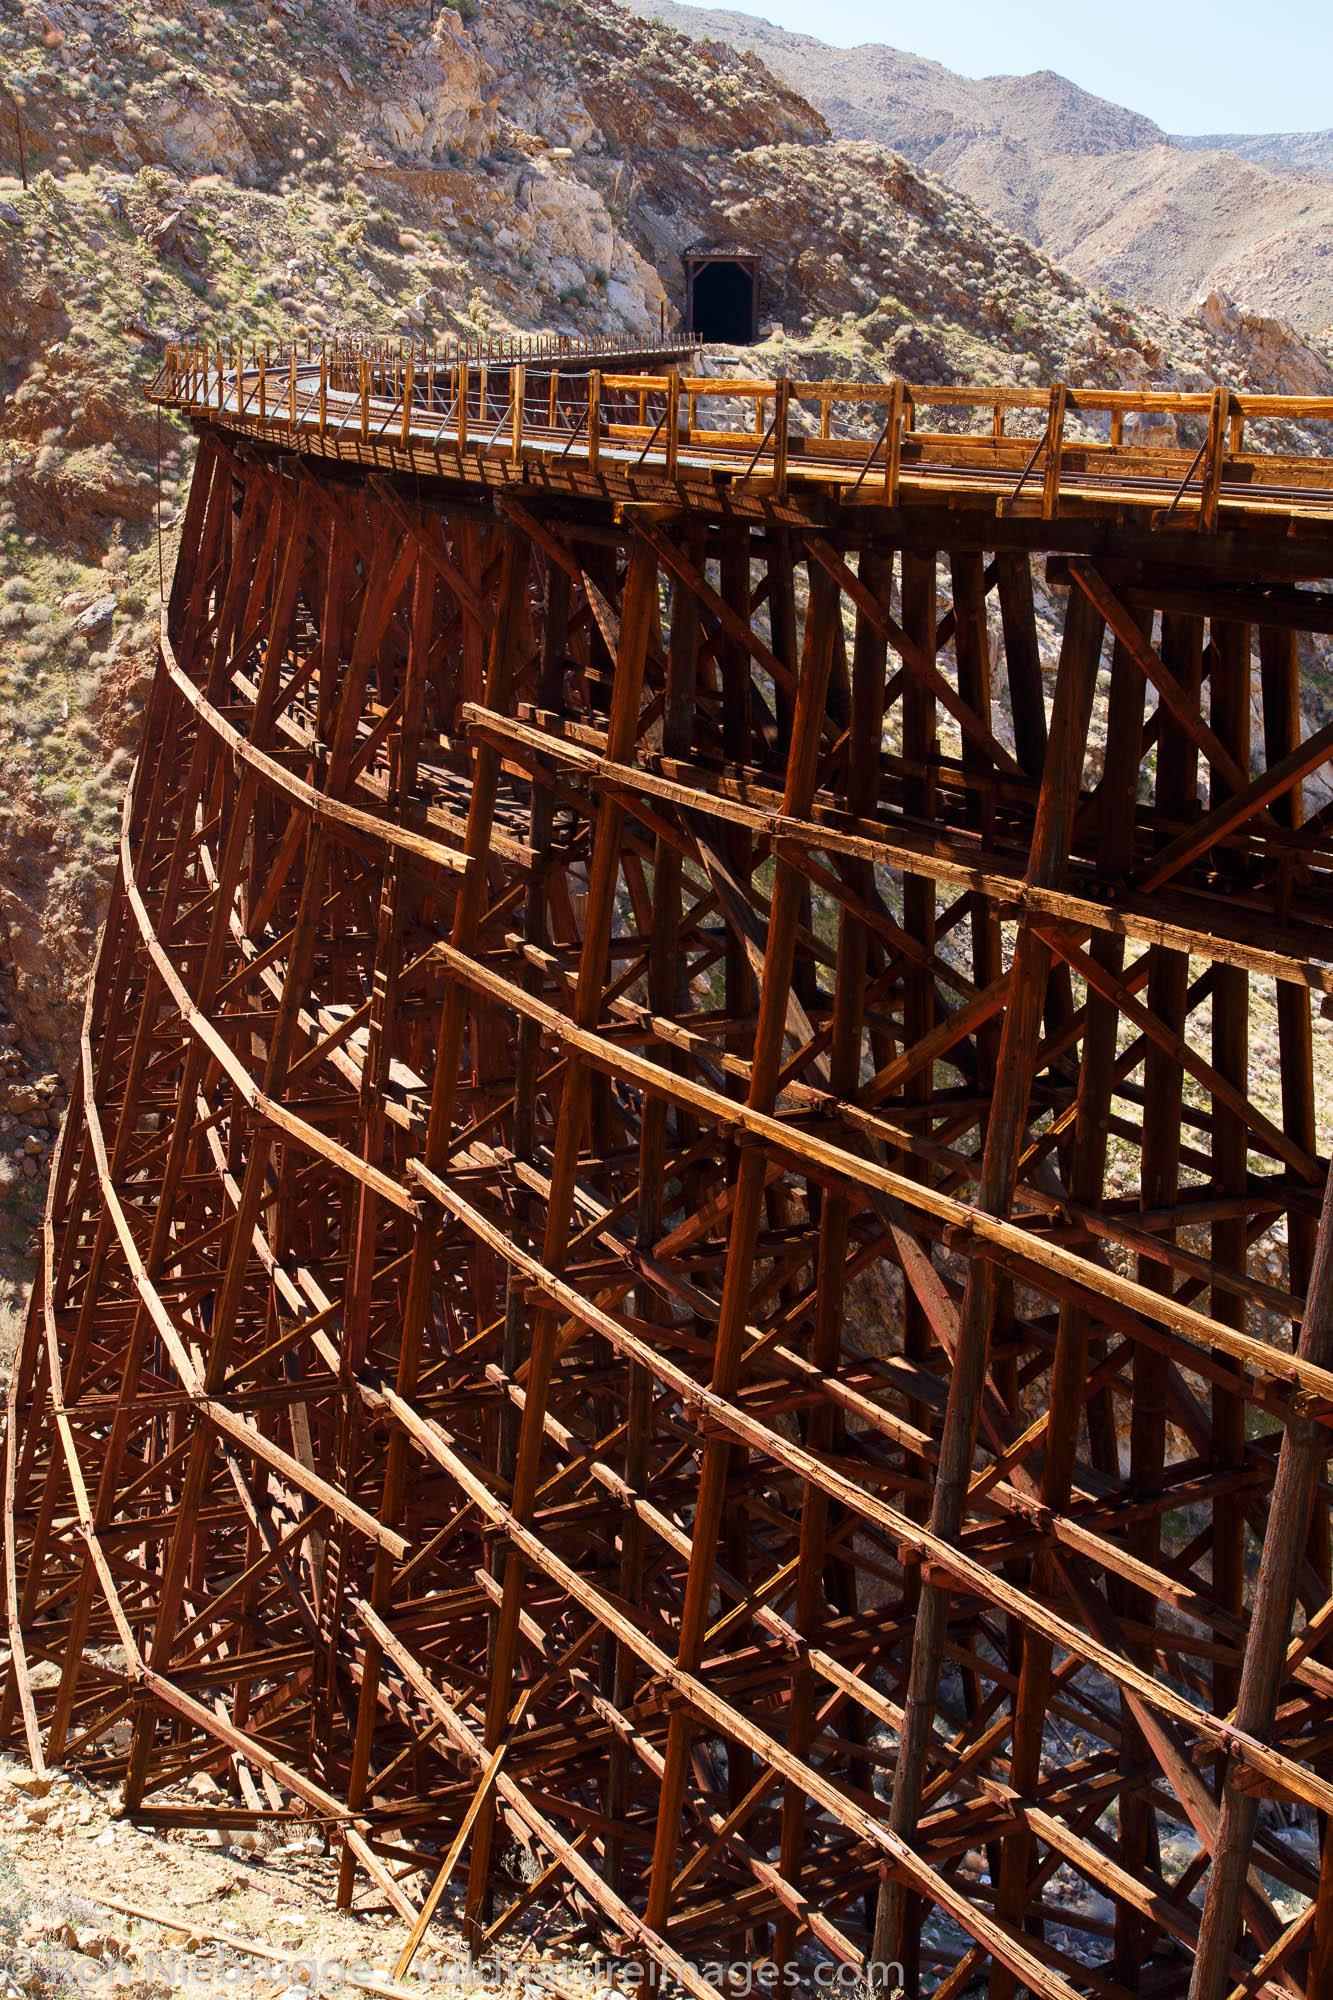 Goat Canyon Trestle on the Carrizo Gorge Railroad Track, Anza-Borrego Desert State Park, California.